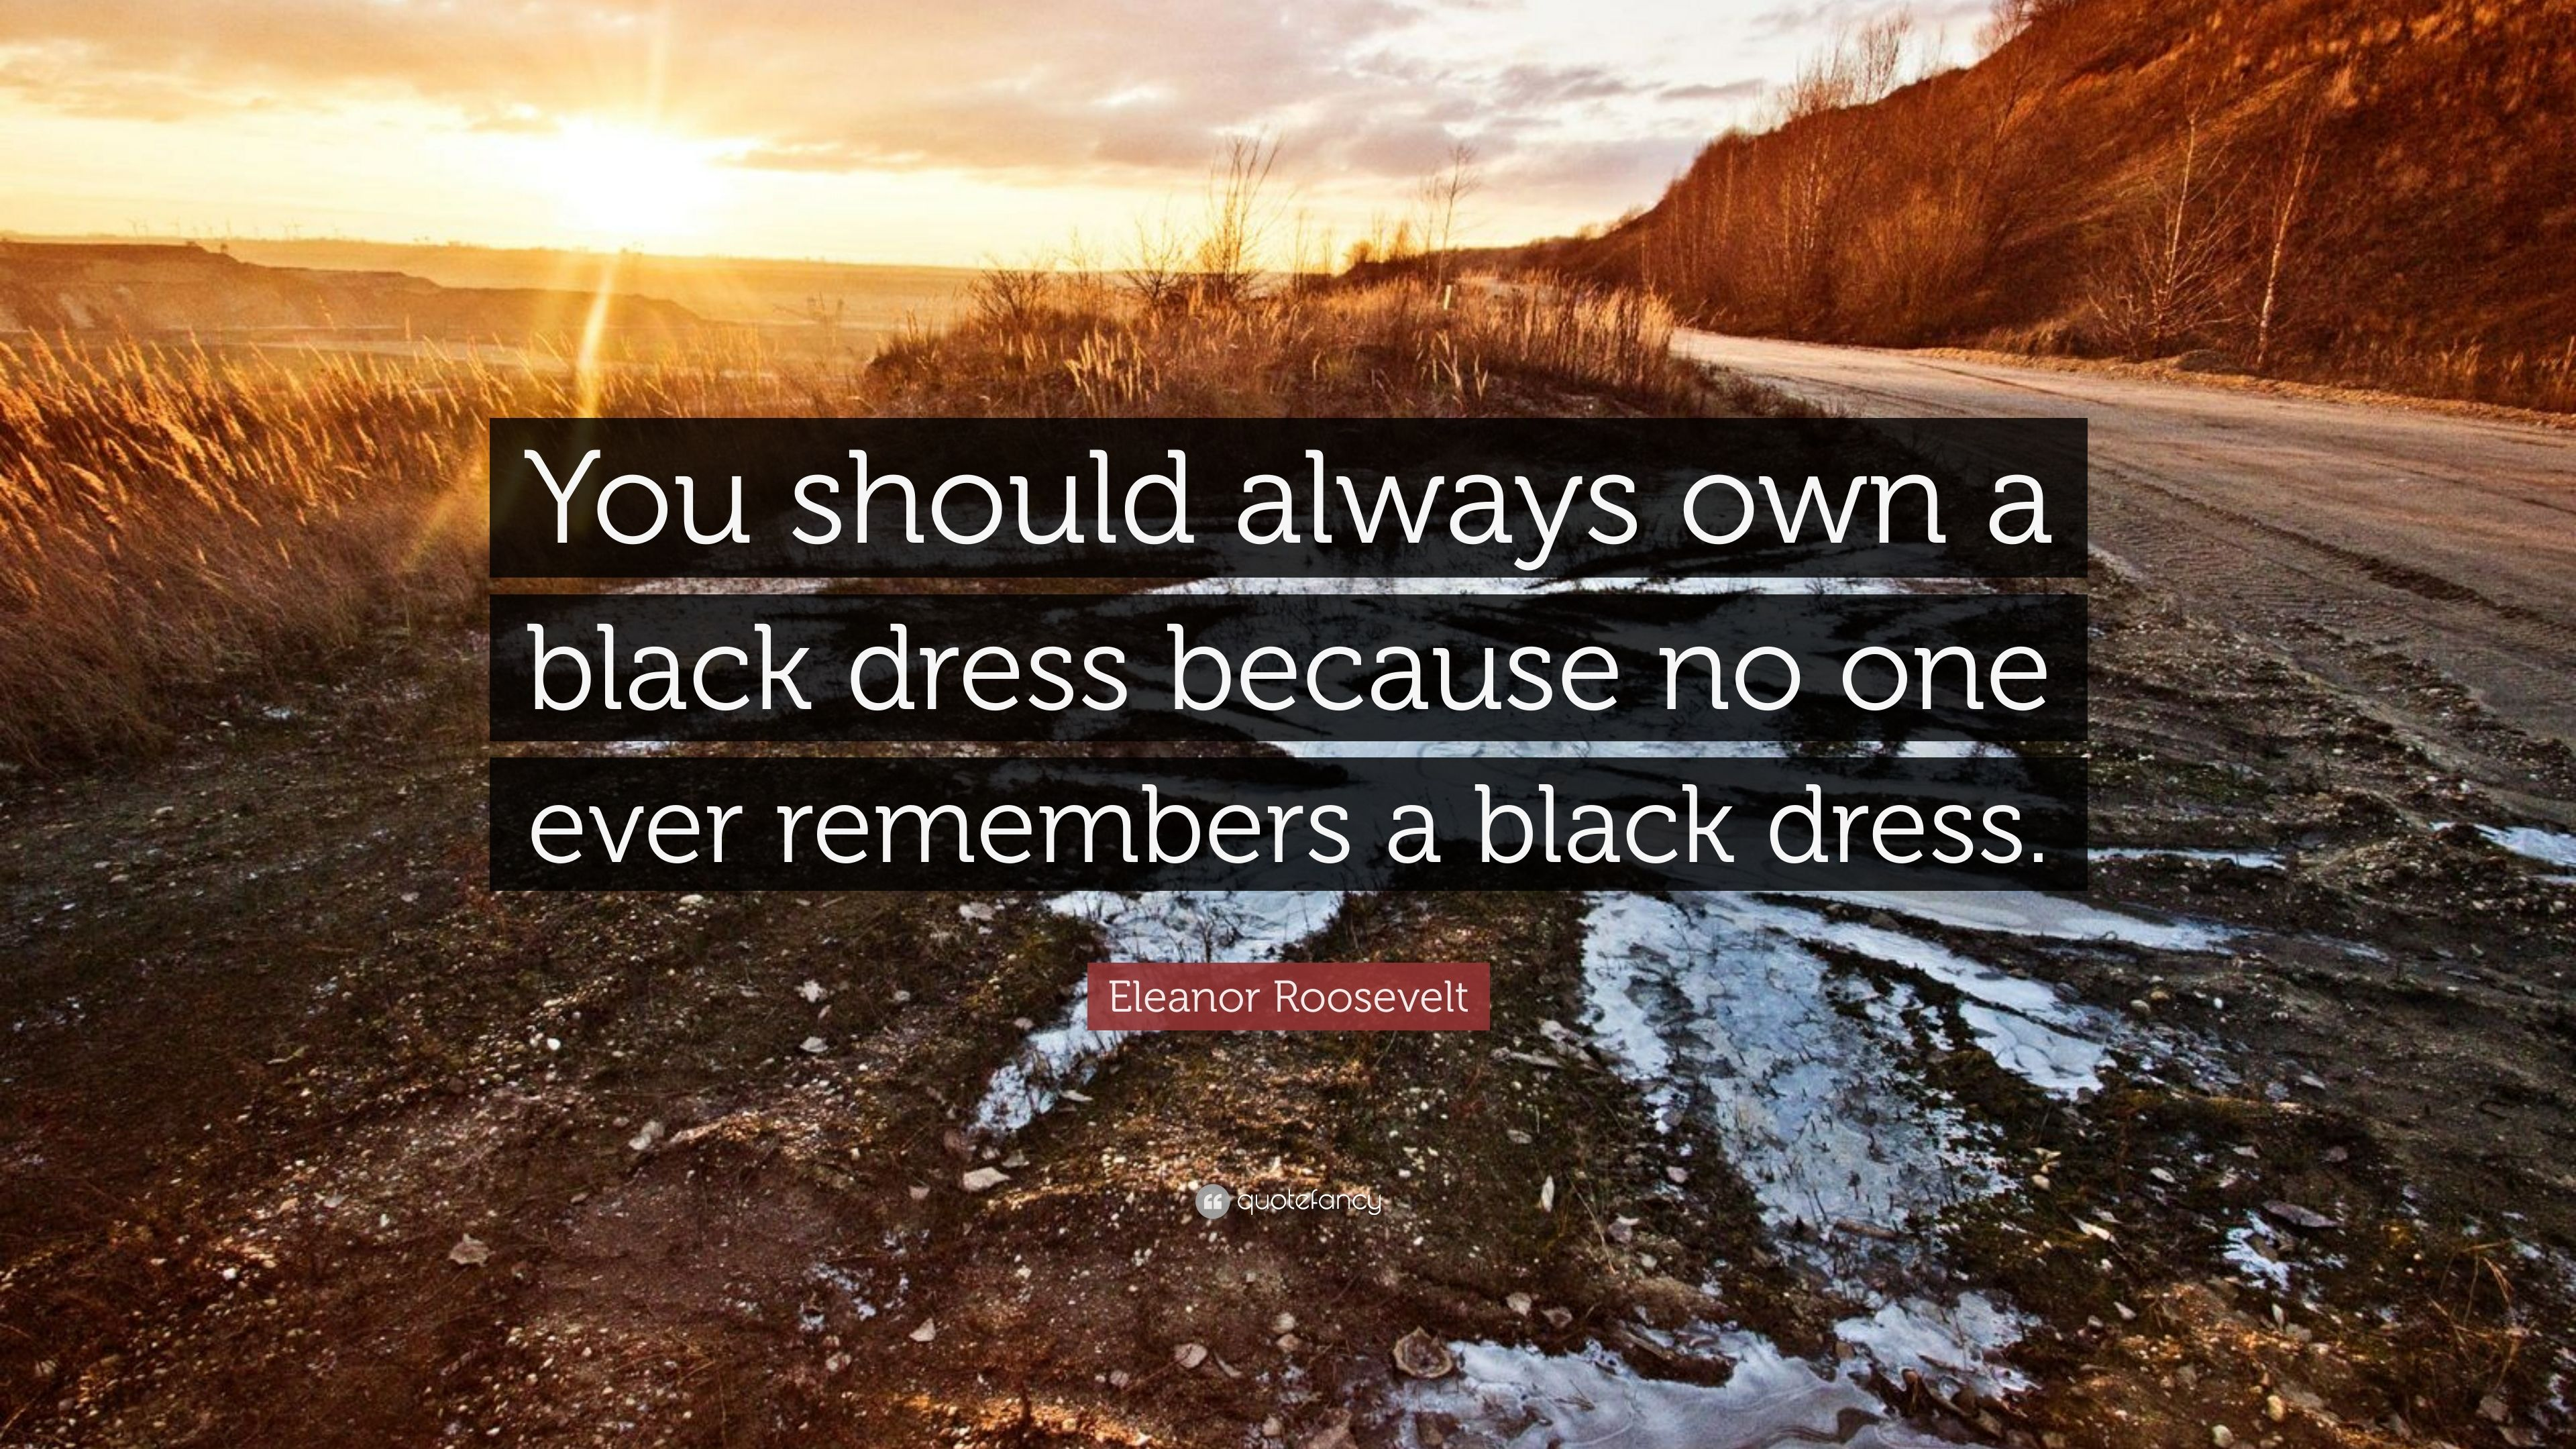 Black dress quotes pinterest - Black Dress Quotes By Eleanor